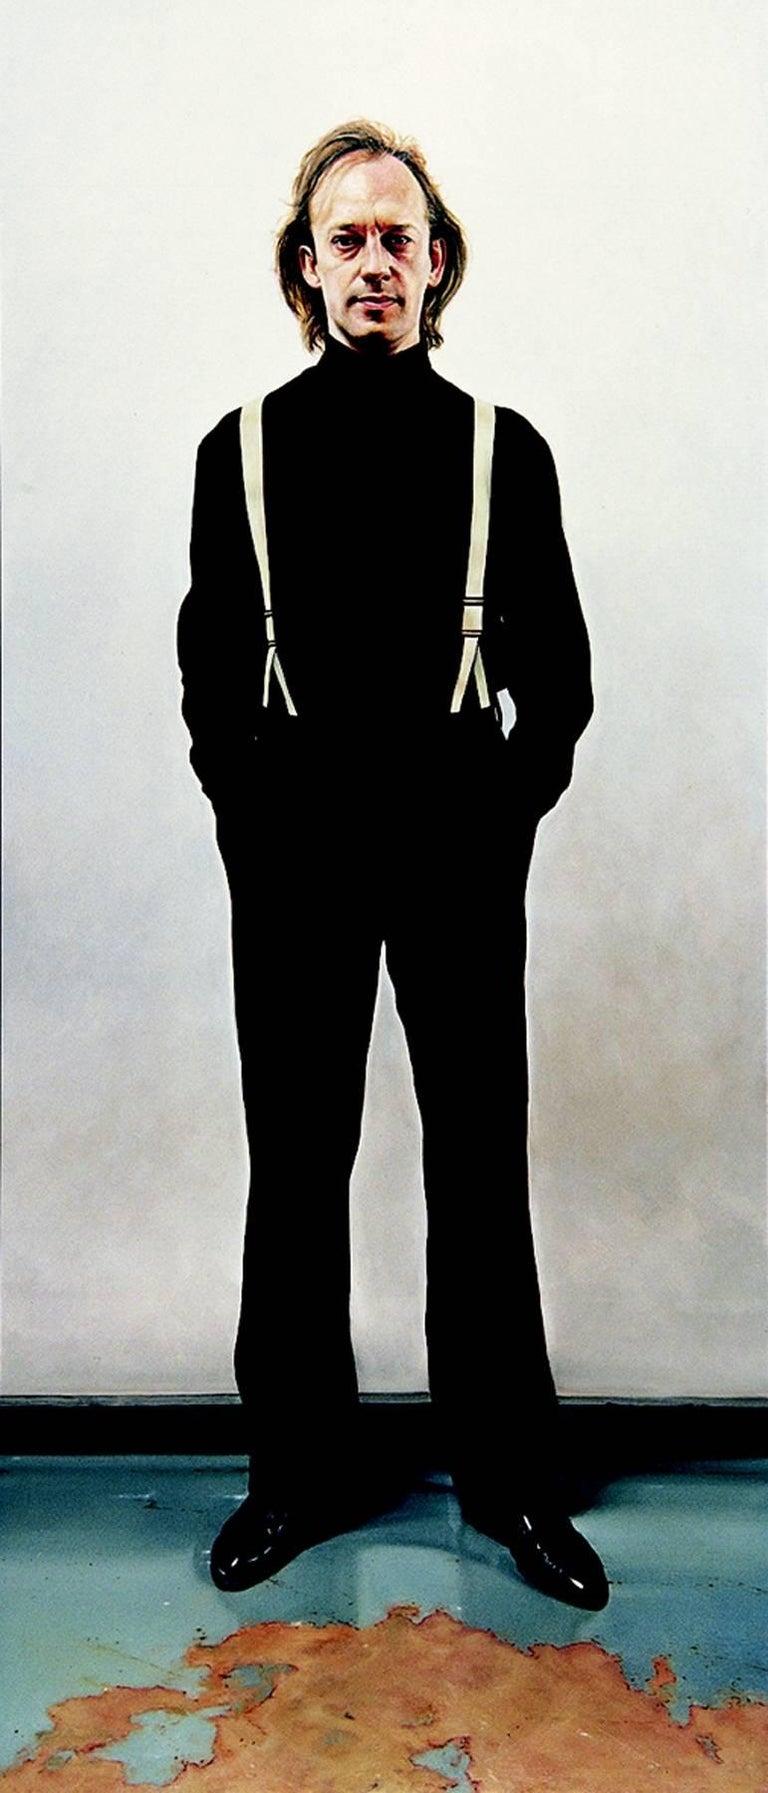 Jeremy Andrews Portrait Painting - NYC Man